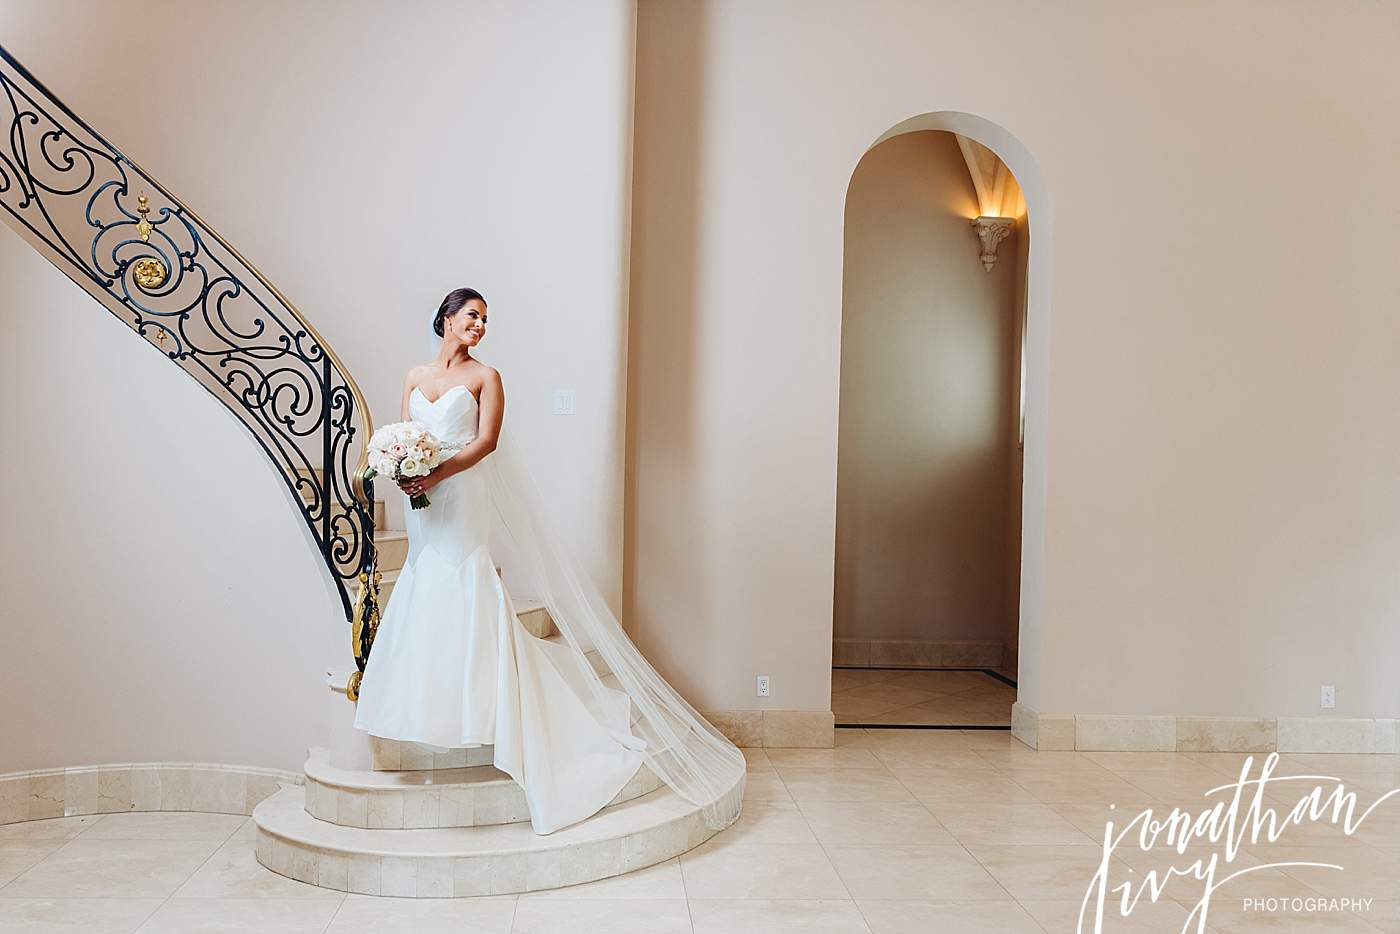 Luxury Wedding Photographer in The Woodlands